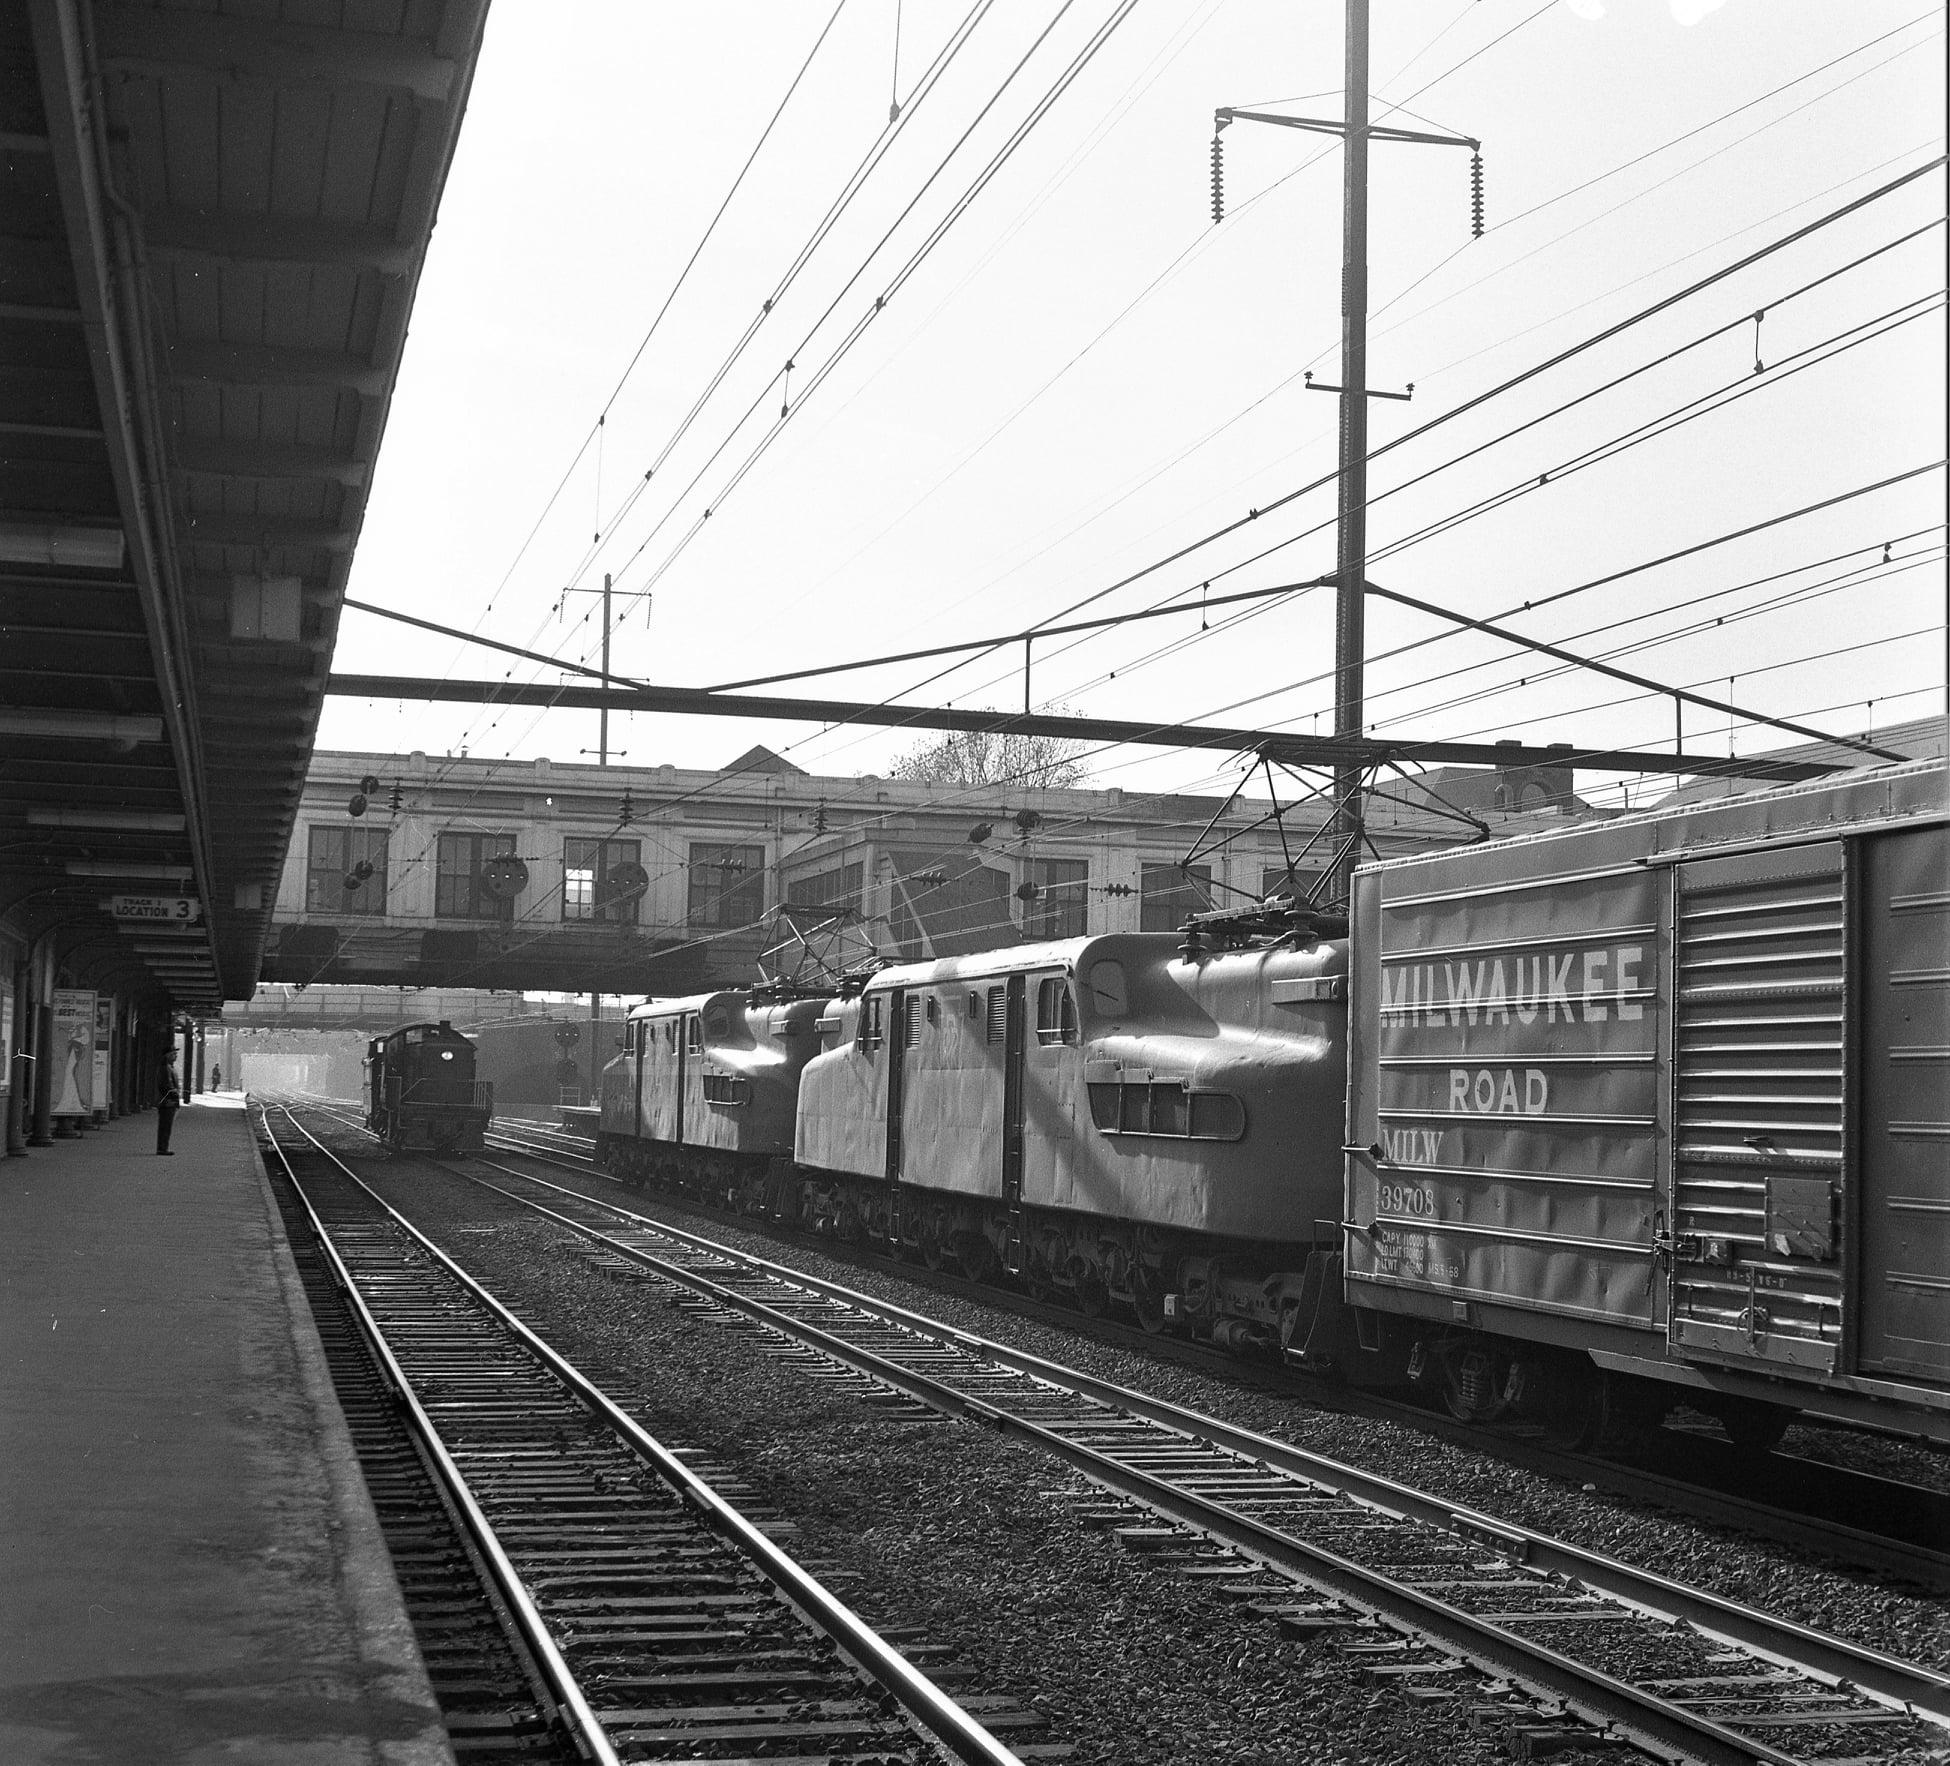 November 23 2020 Trenton NJ H. Smith Photo.jpg